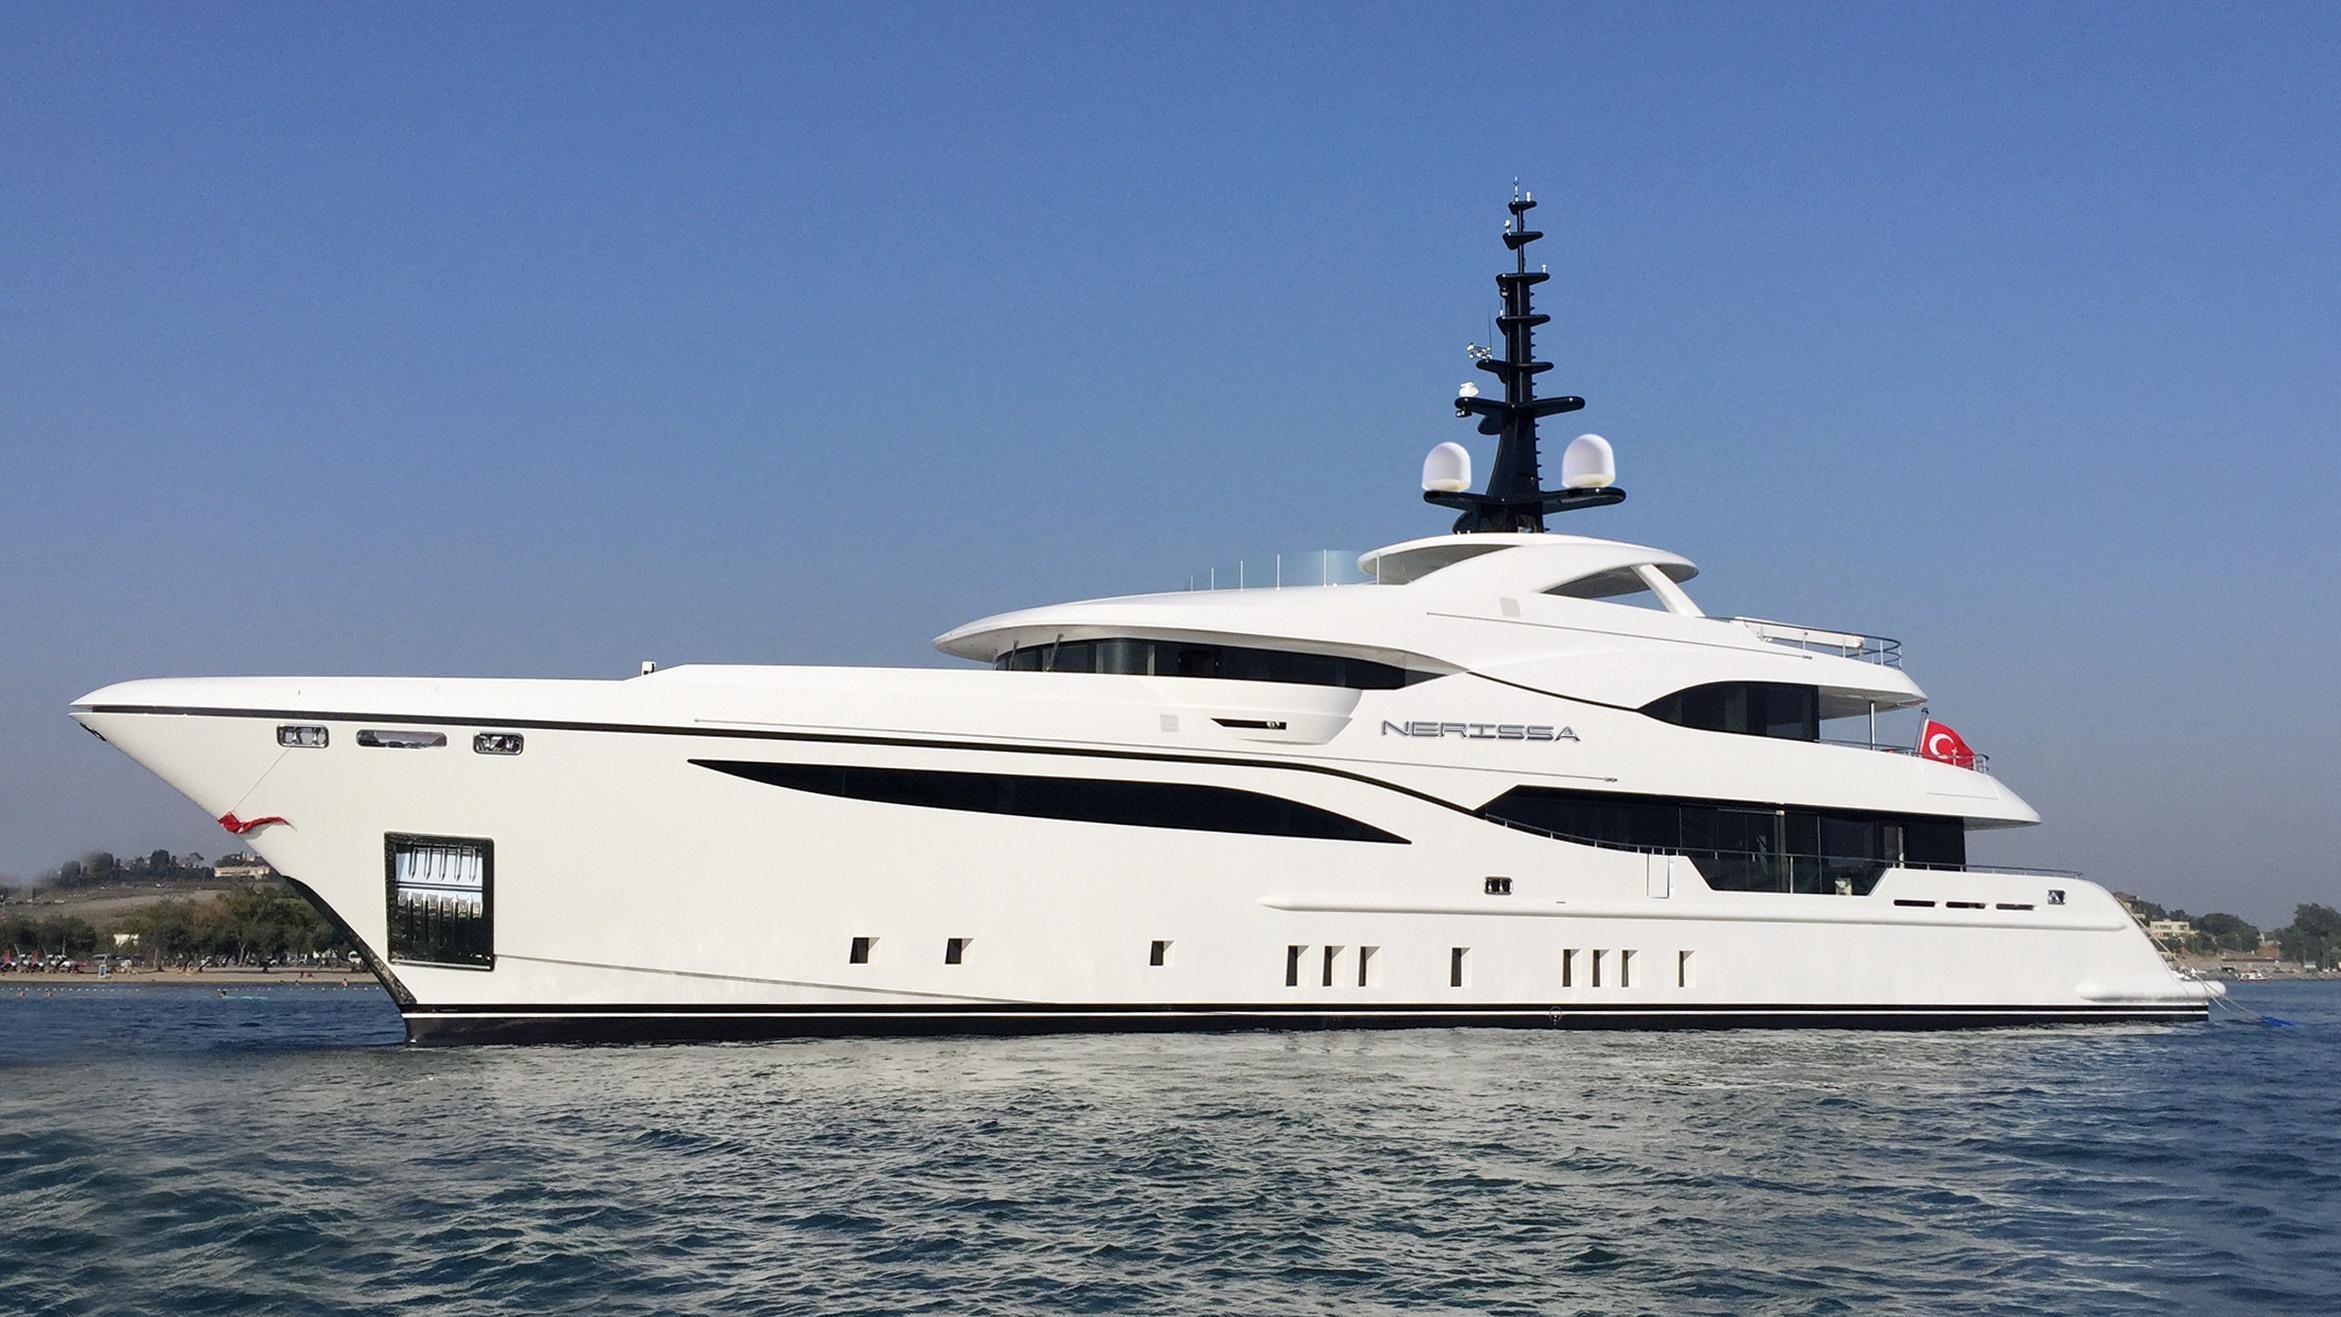 nerissa motoryacht bilgin 47m 2017 launch profile